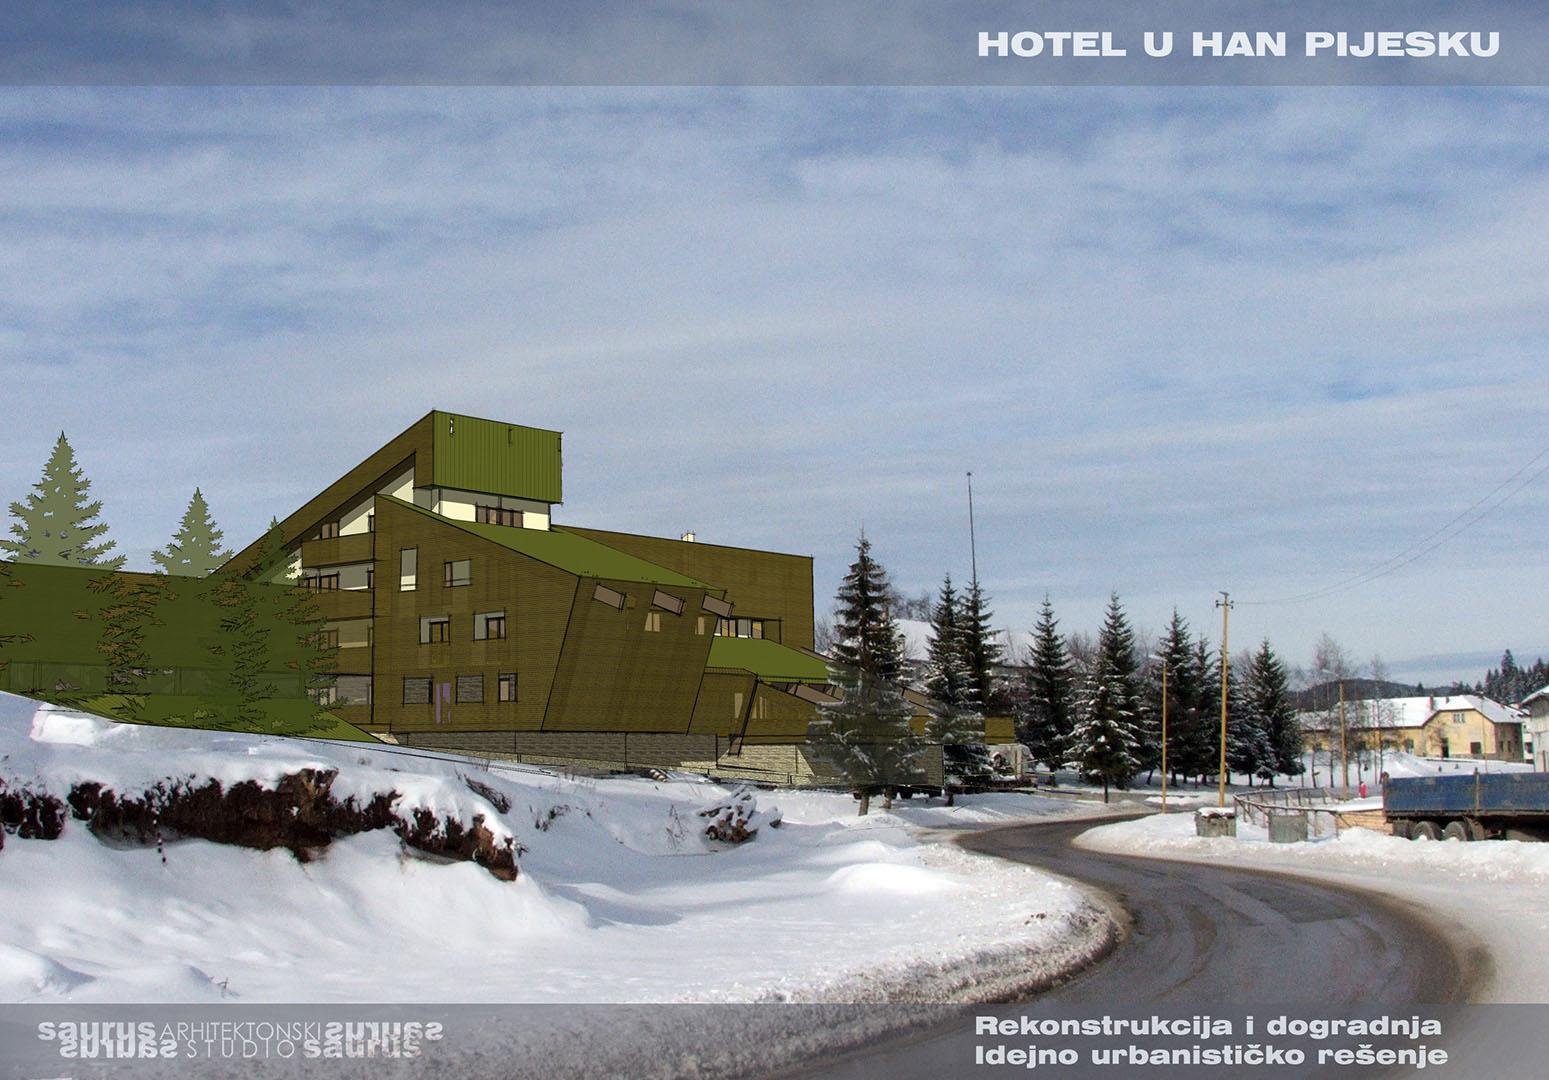 HOTEL GORA I ETNO PARK HAN PIJESAK